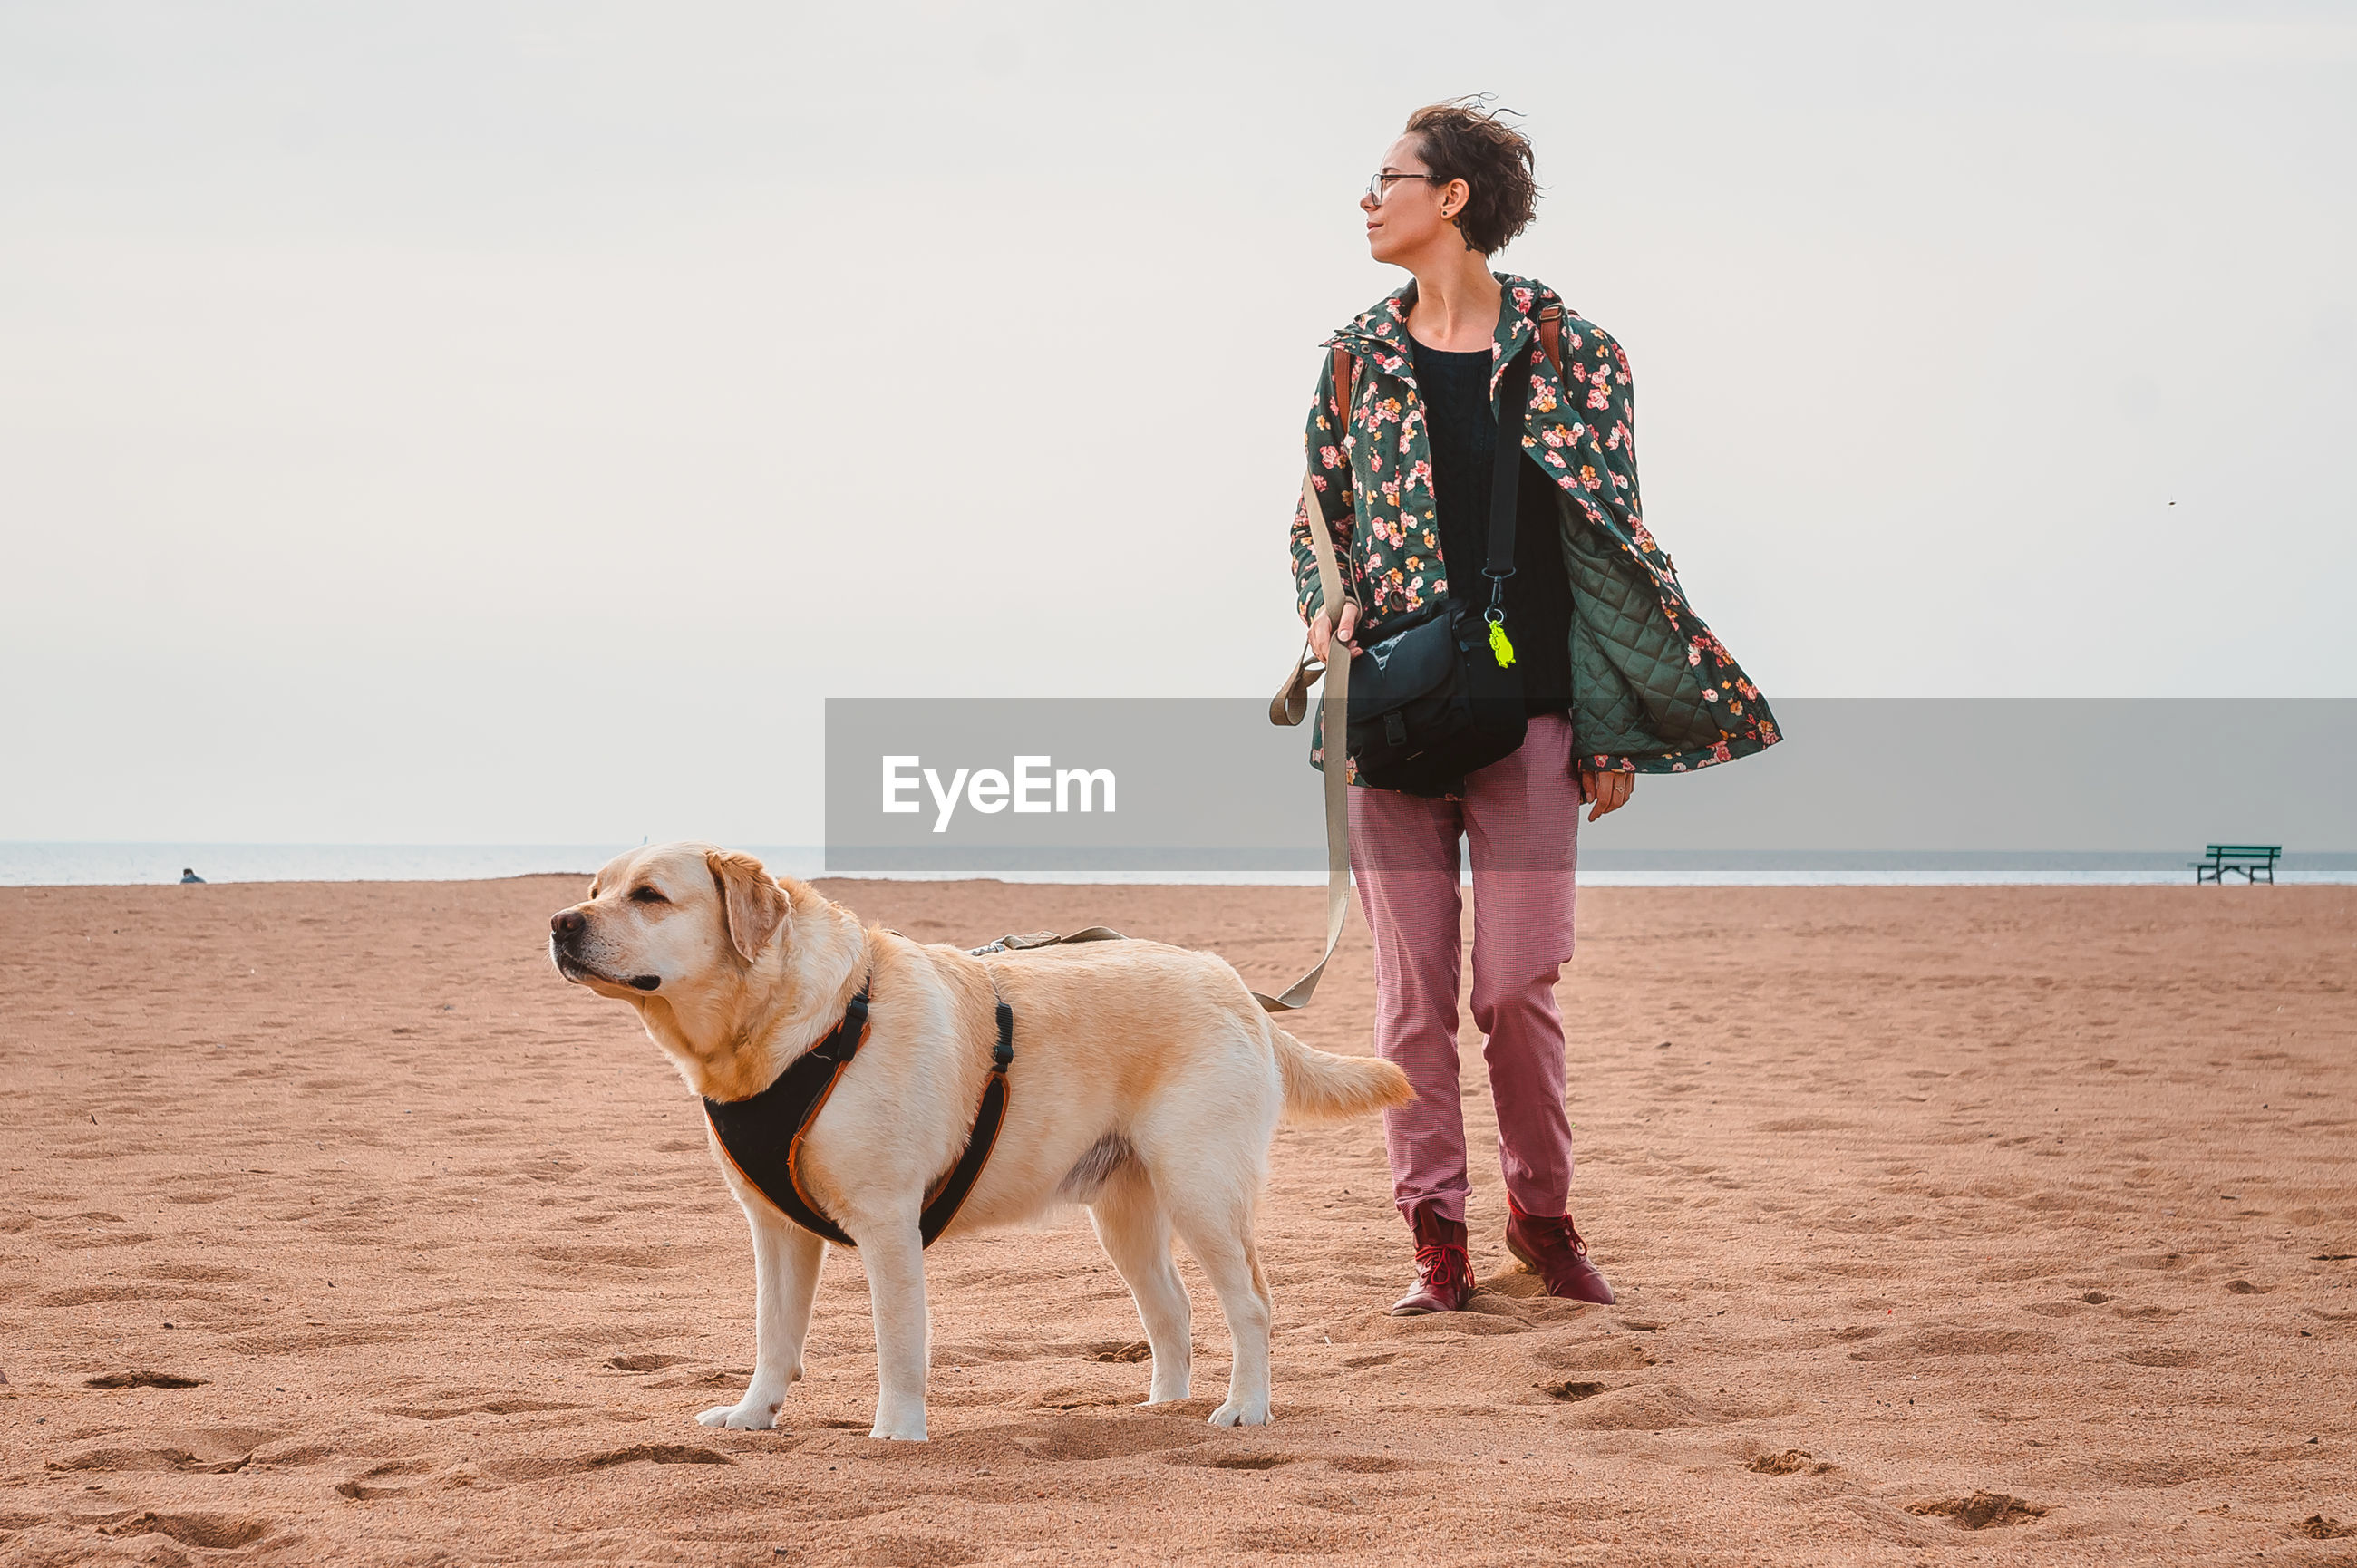 A girl and a fawn labrador retriever walk on a sandy beach. traveling with a dog on the sea